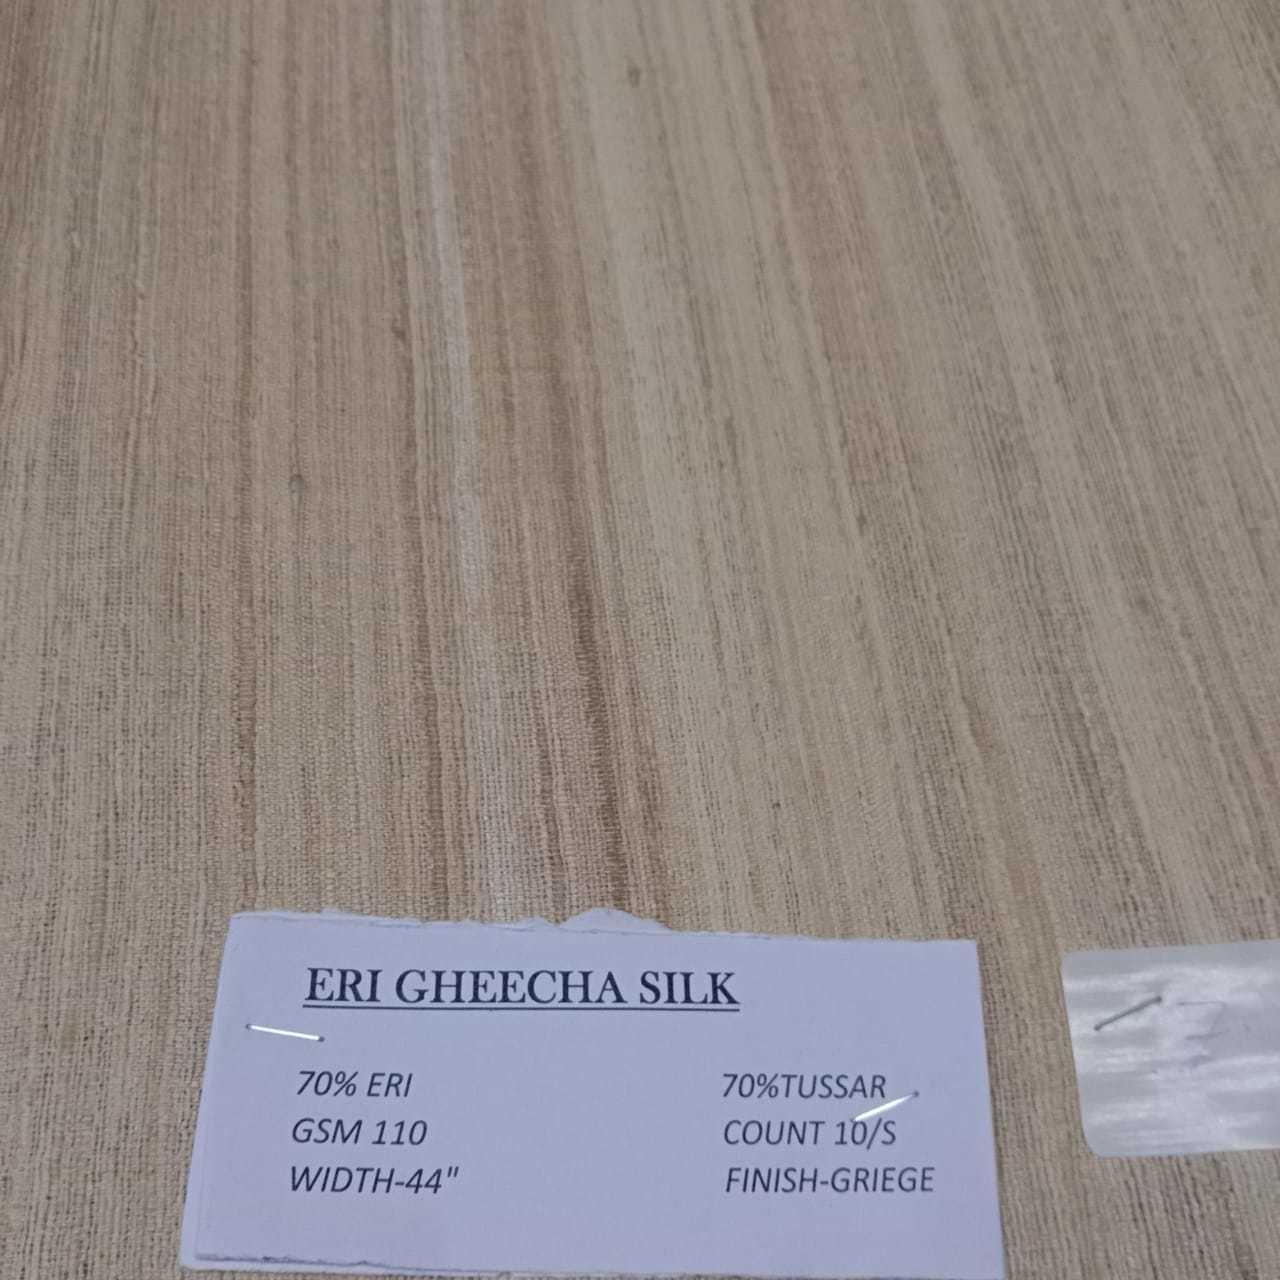 Eri Gheecha Silk Fabric